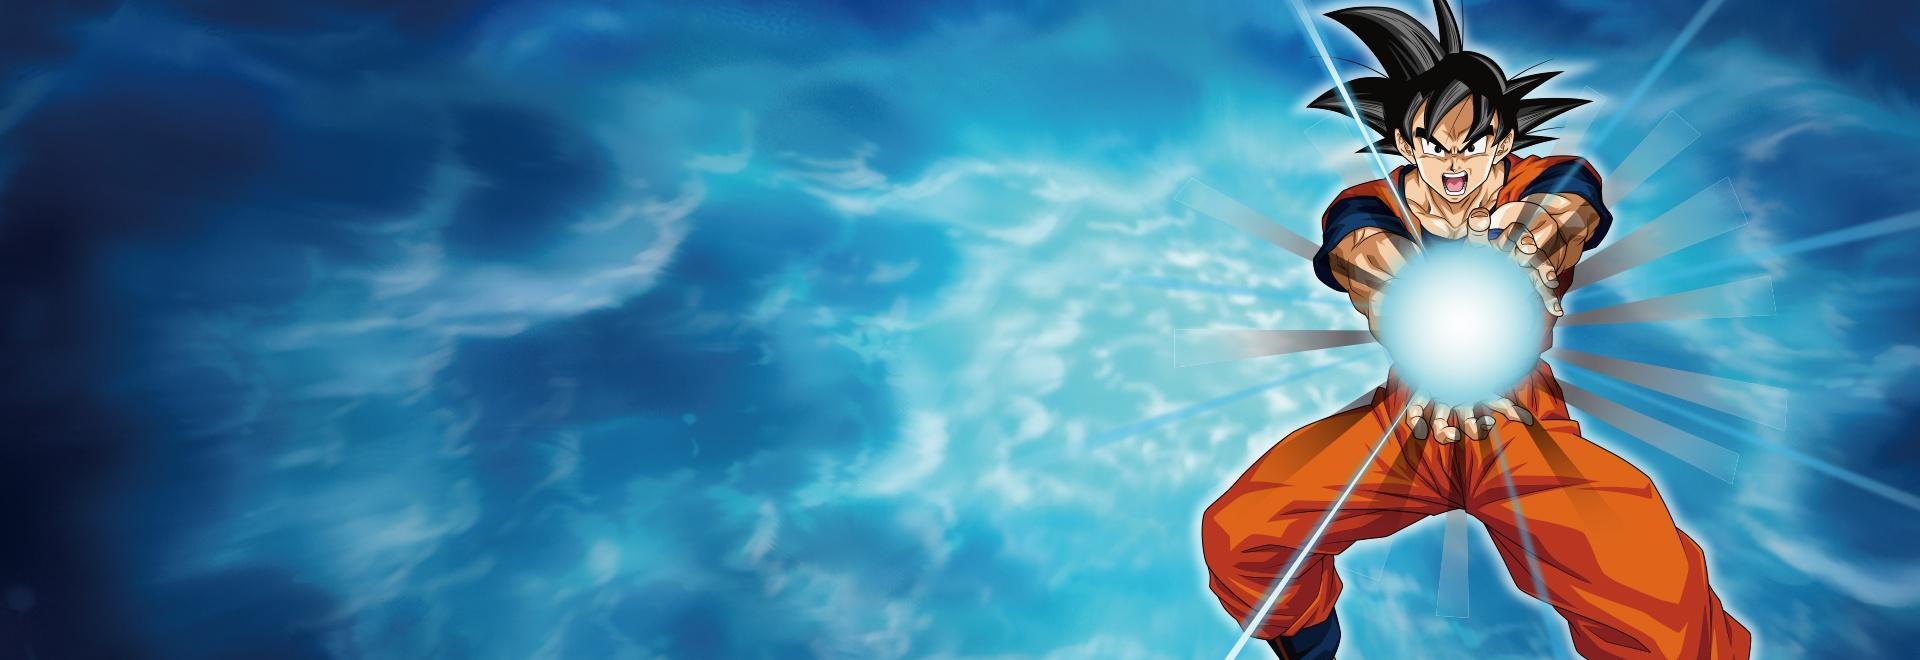 Vegeta affronta il Saiyan del Sesto Universo